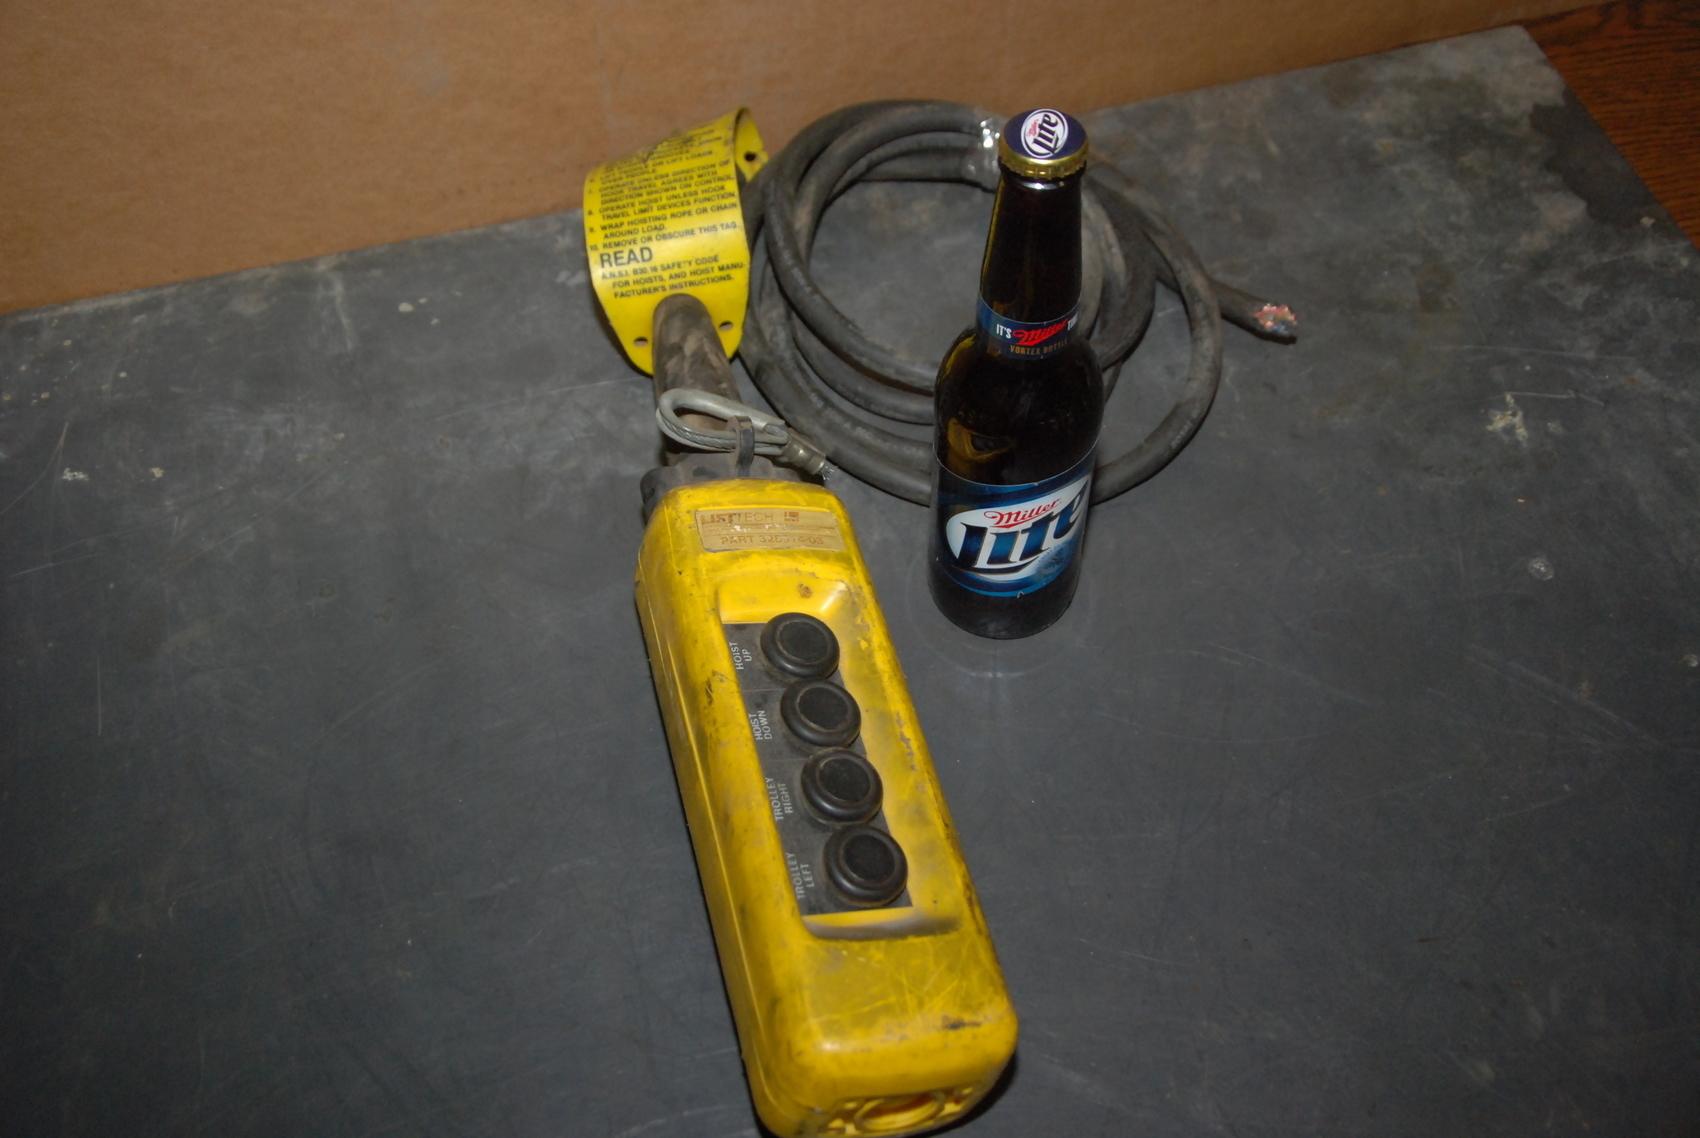 Lift Tech 328314-03 push button station for hoist